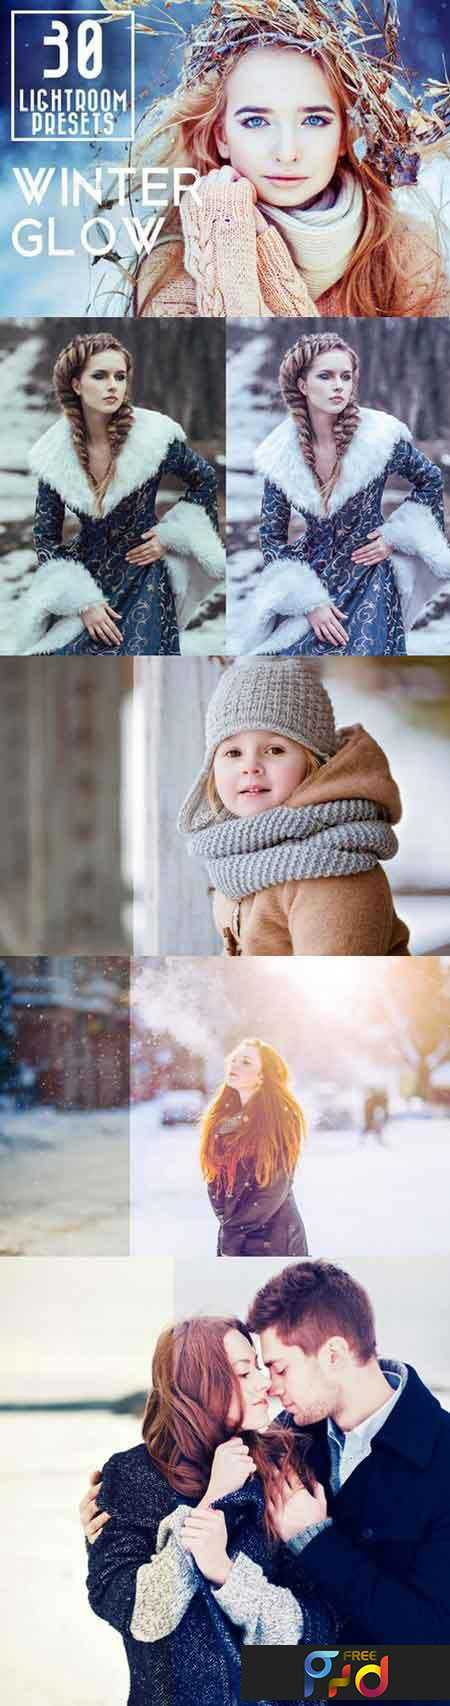 freepsdvn-com_action_1477626259_30-winter-glow-lightroom-presets-977659